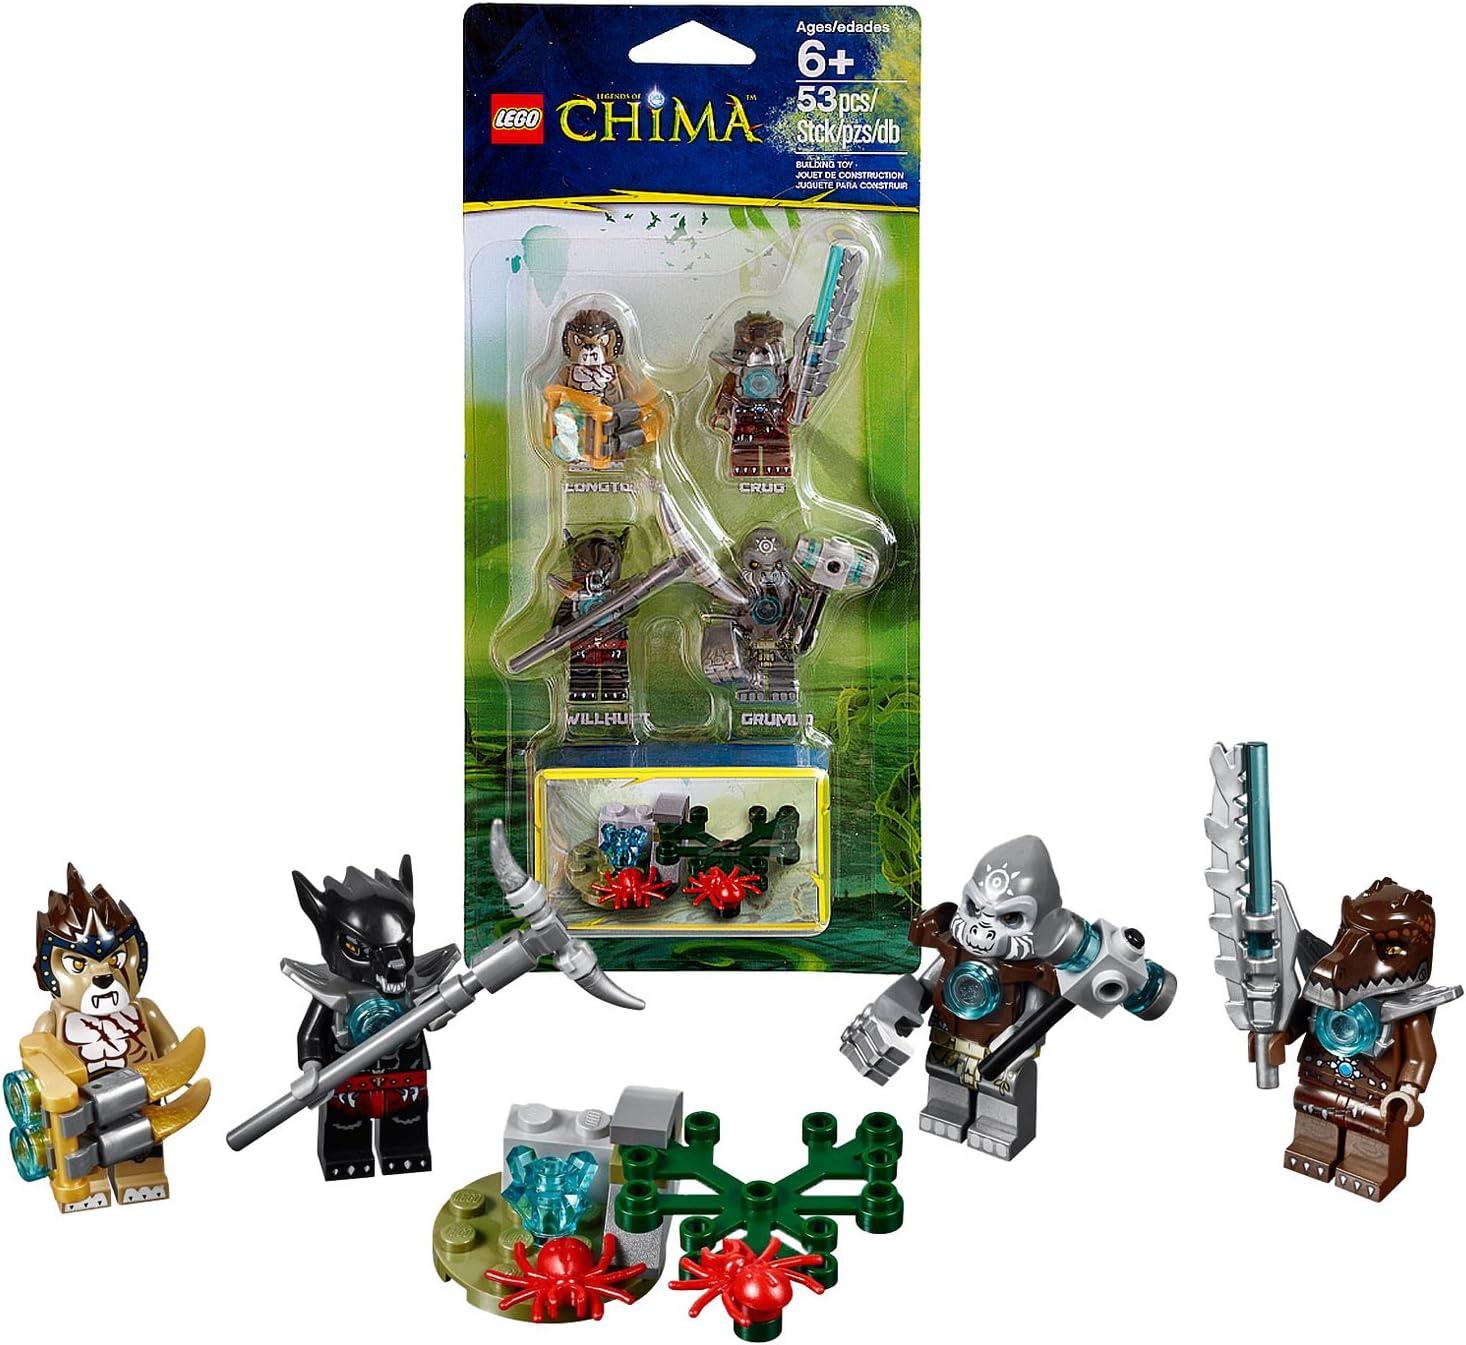 LEGO Legends of Chima Crug Minifigure Crocodile Tribe Mini Fig